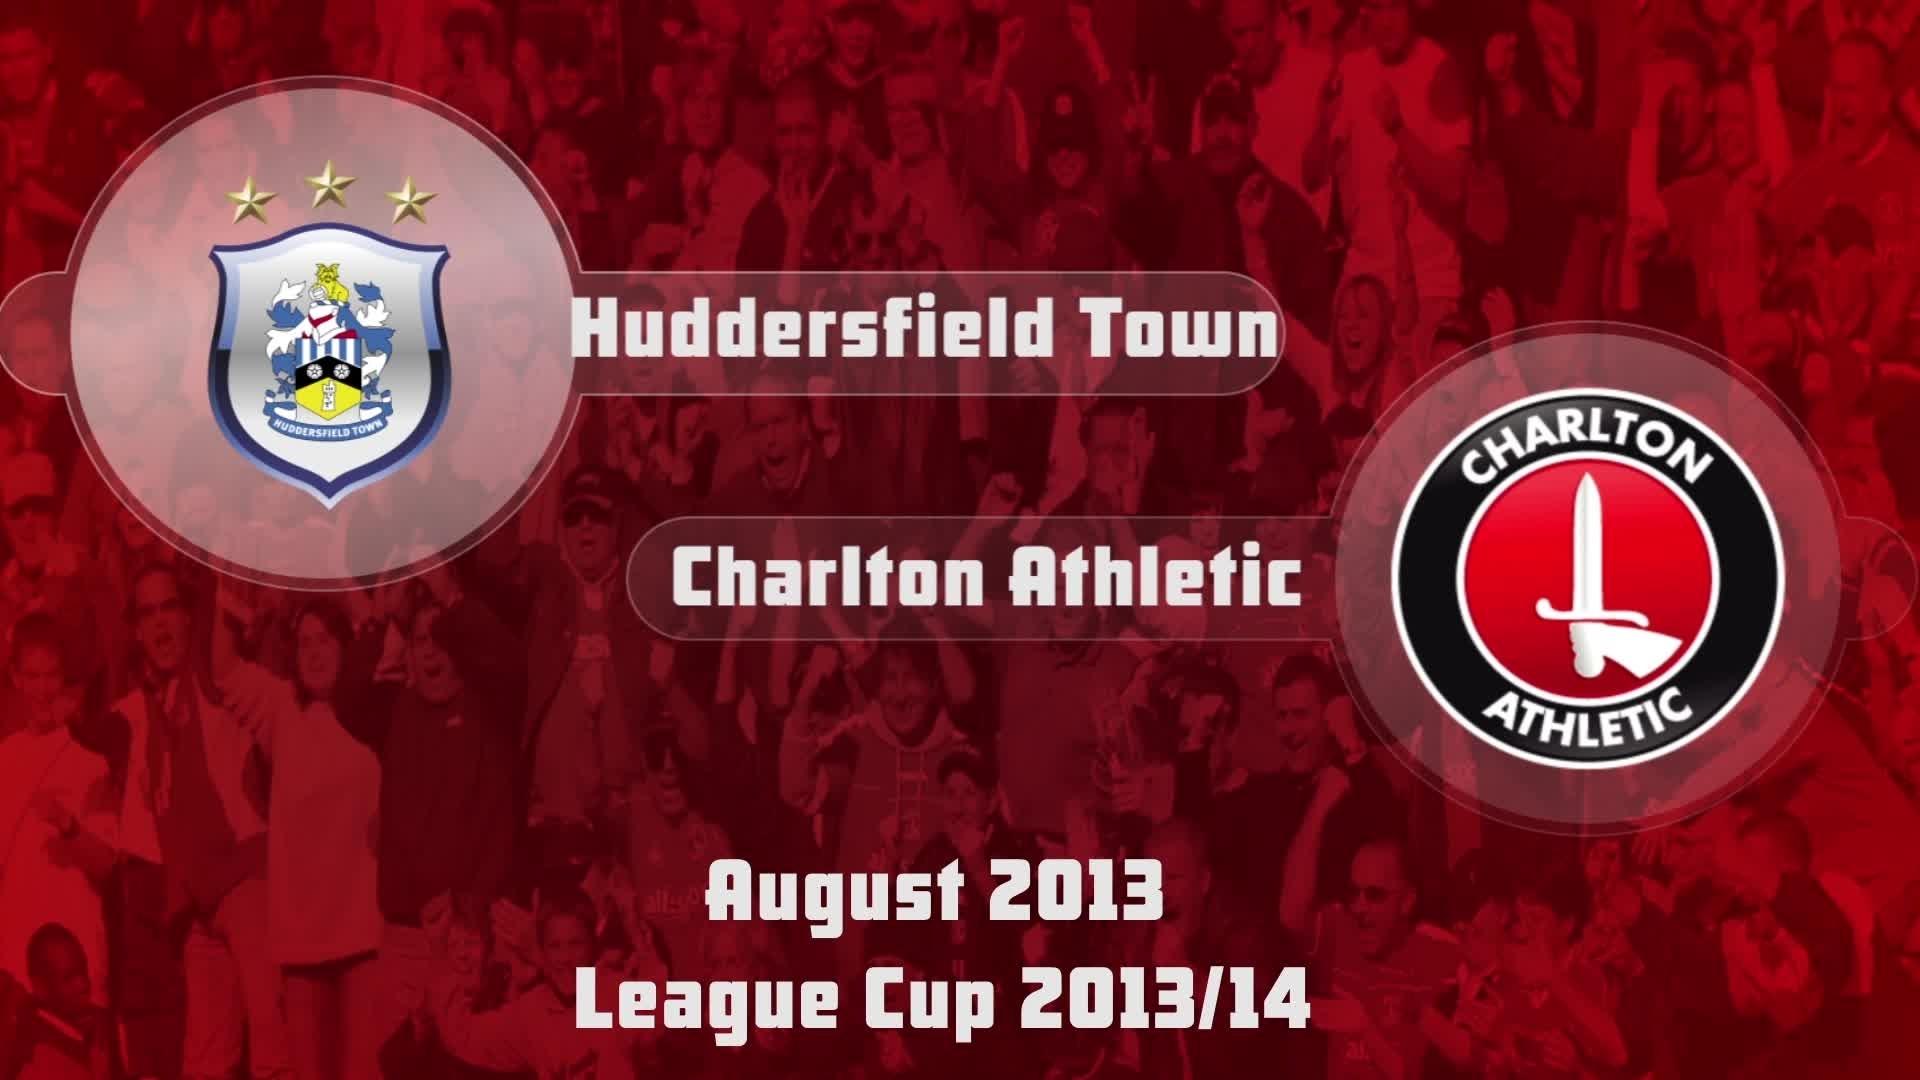 05 HIGHLIGHTS | Huddersfield 3 Charlton 2 (League Cup Aug 2013)